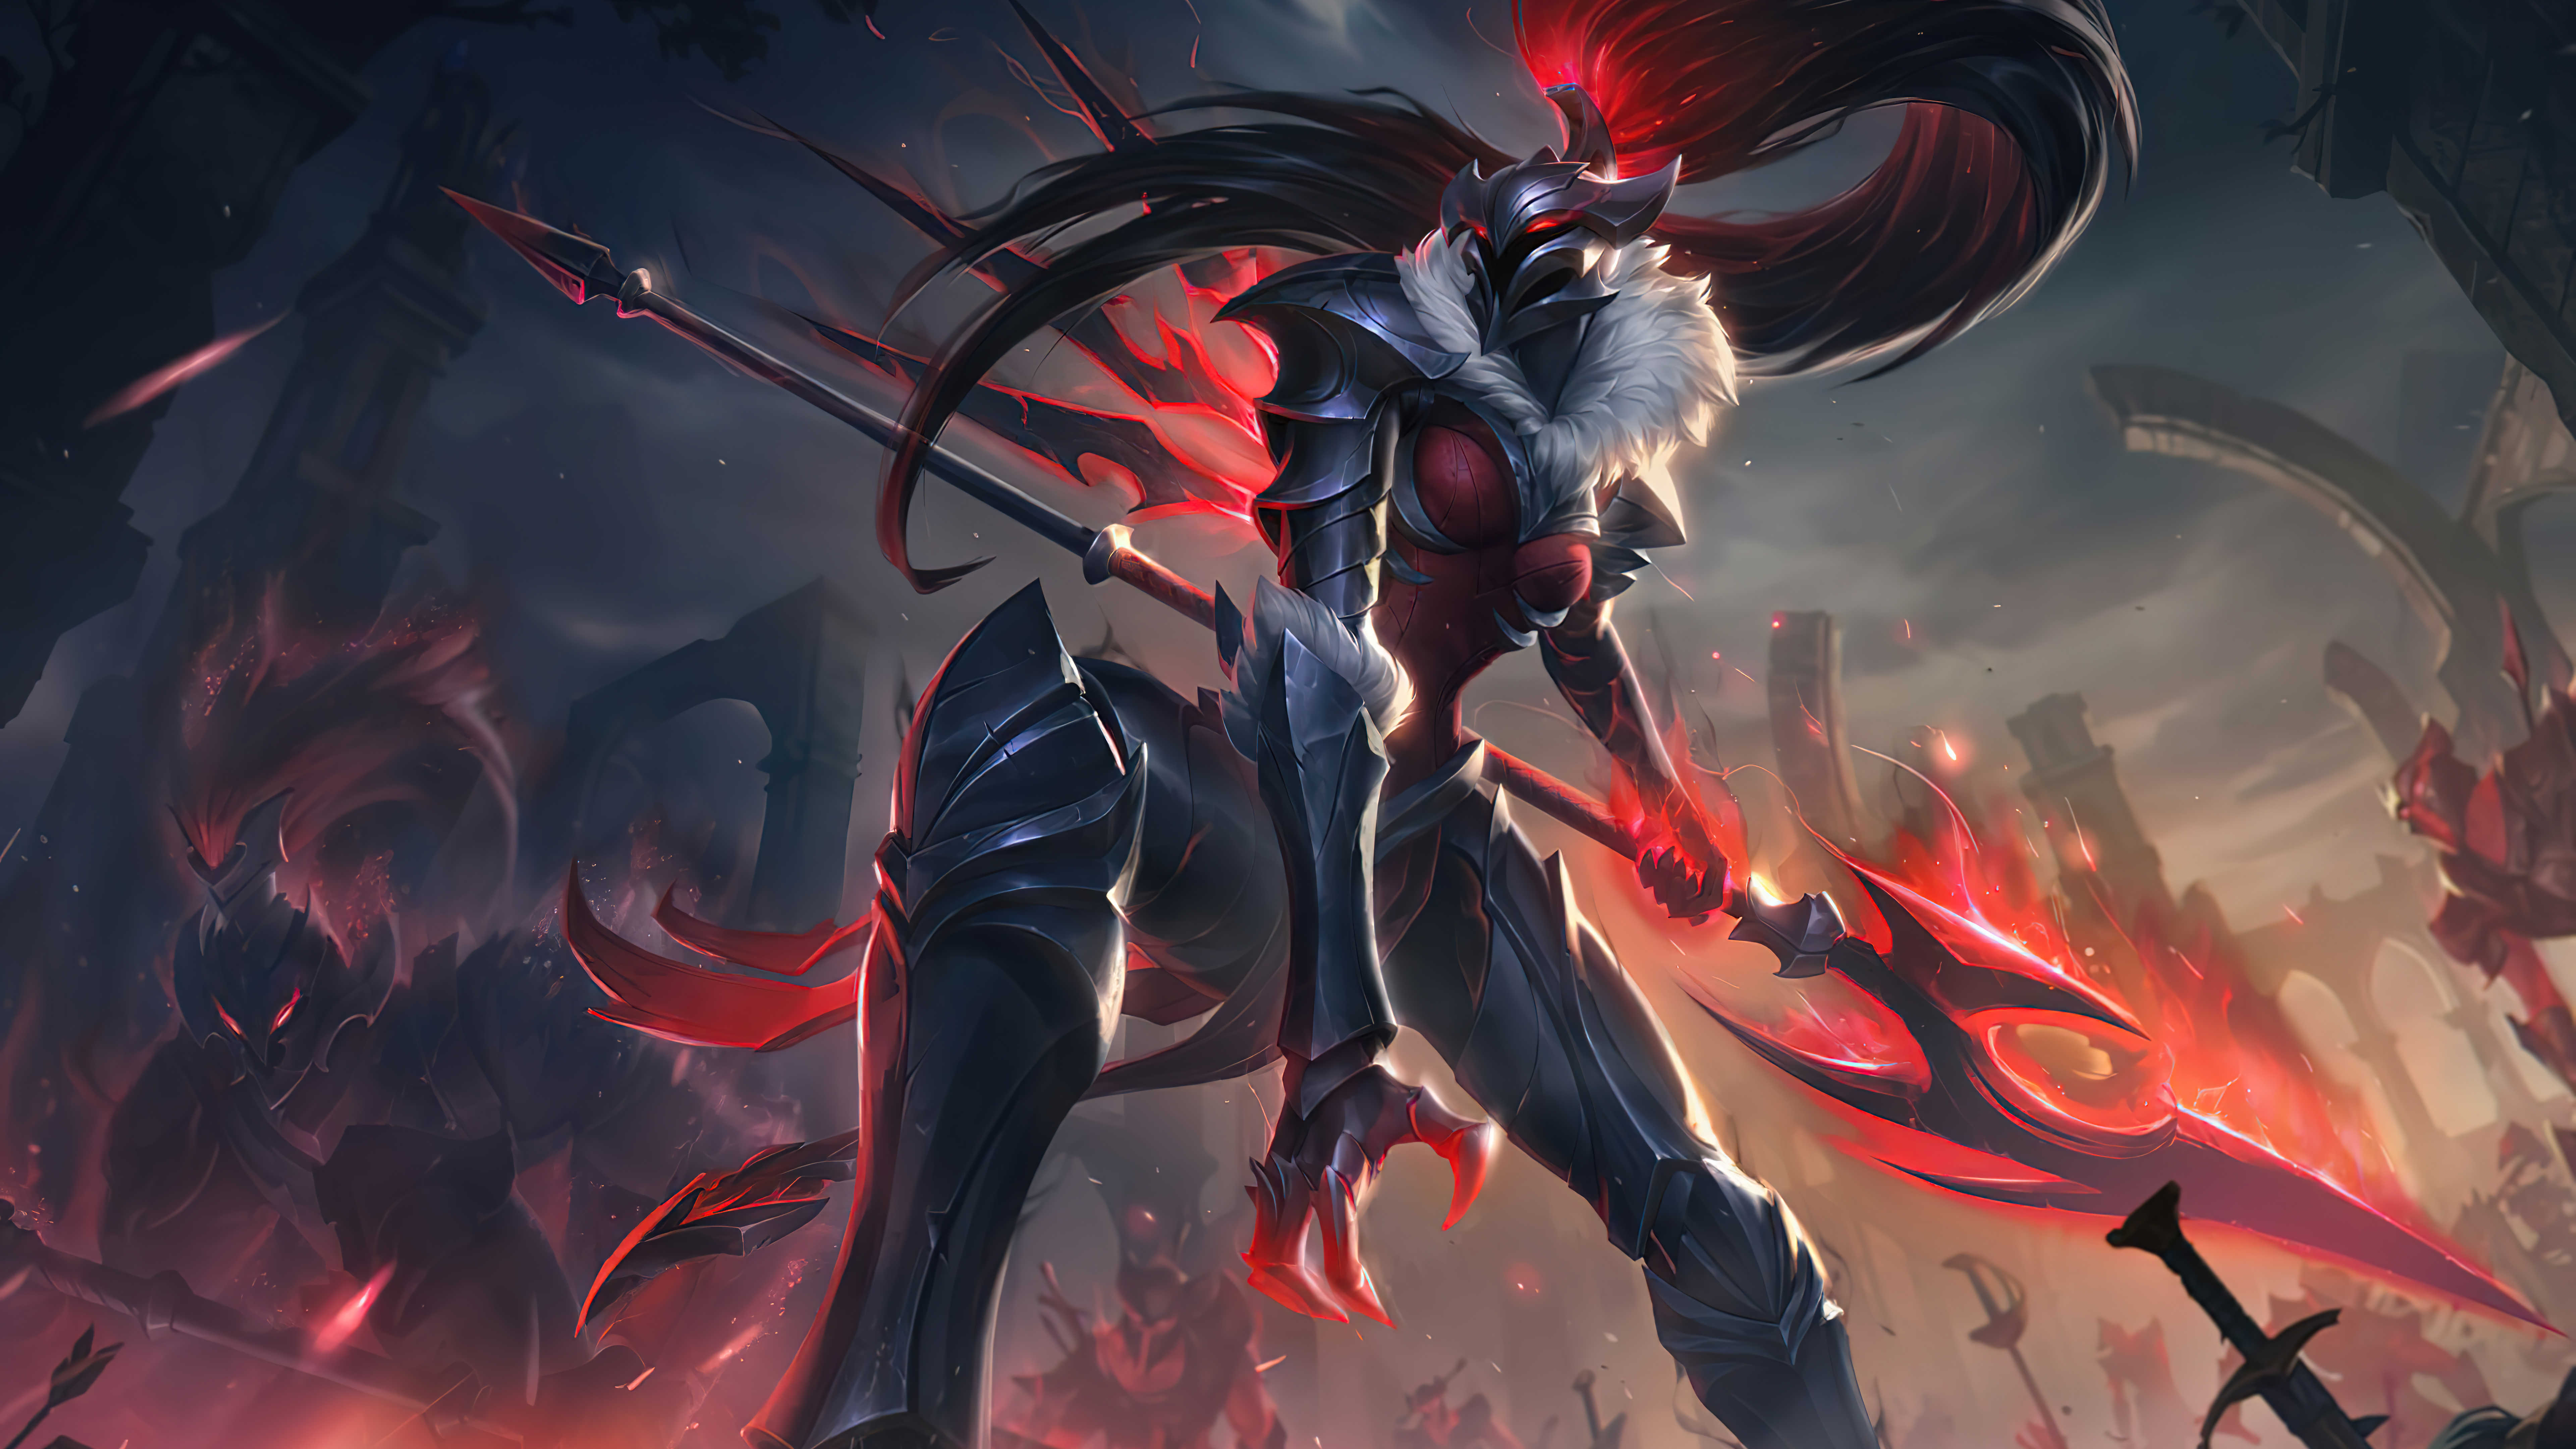 League Of Legends Kalista For Desktop Wallpaper